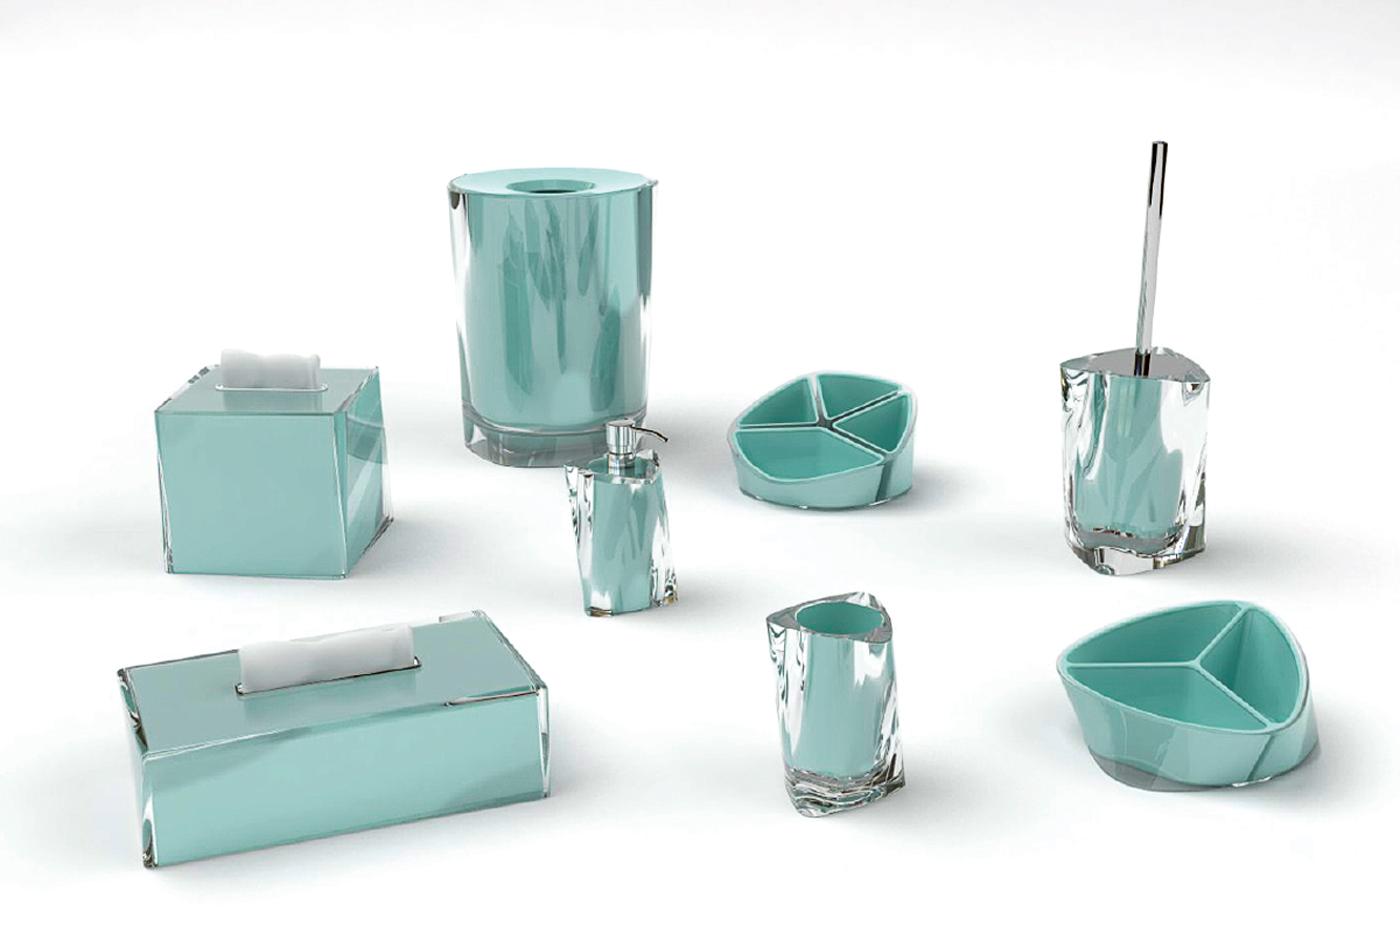 Product-Bathroom-accessoires